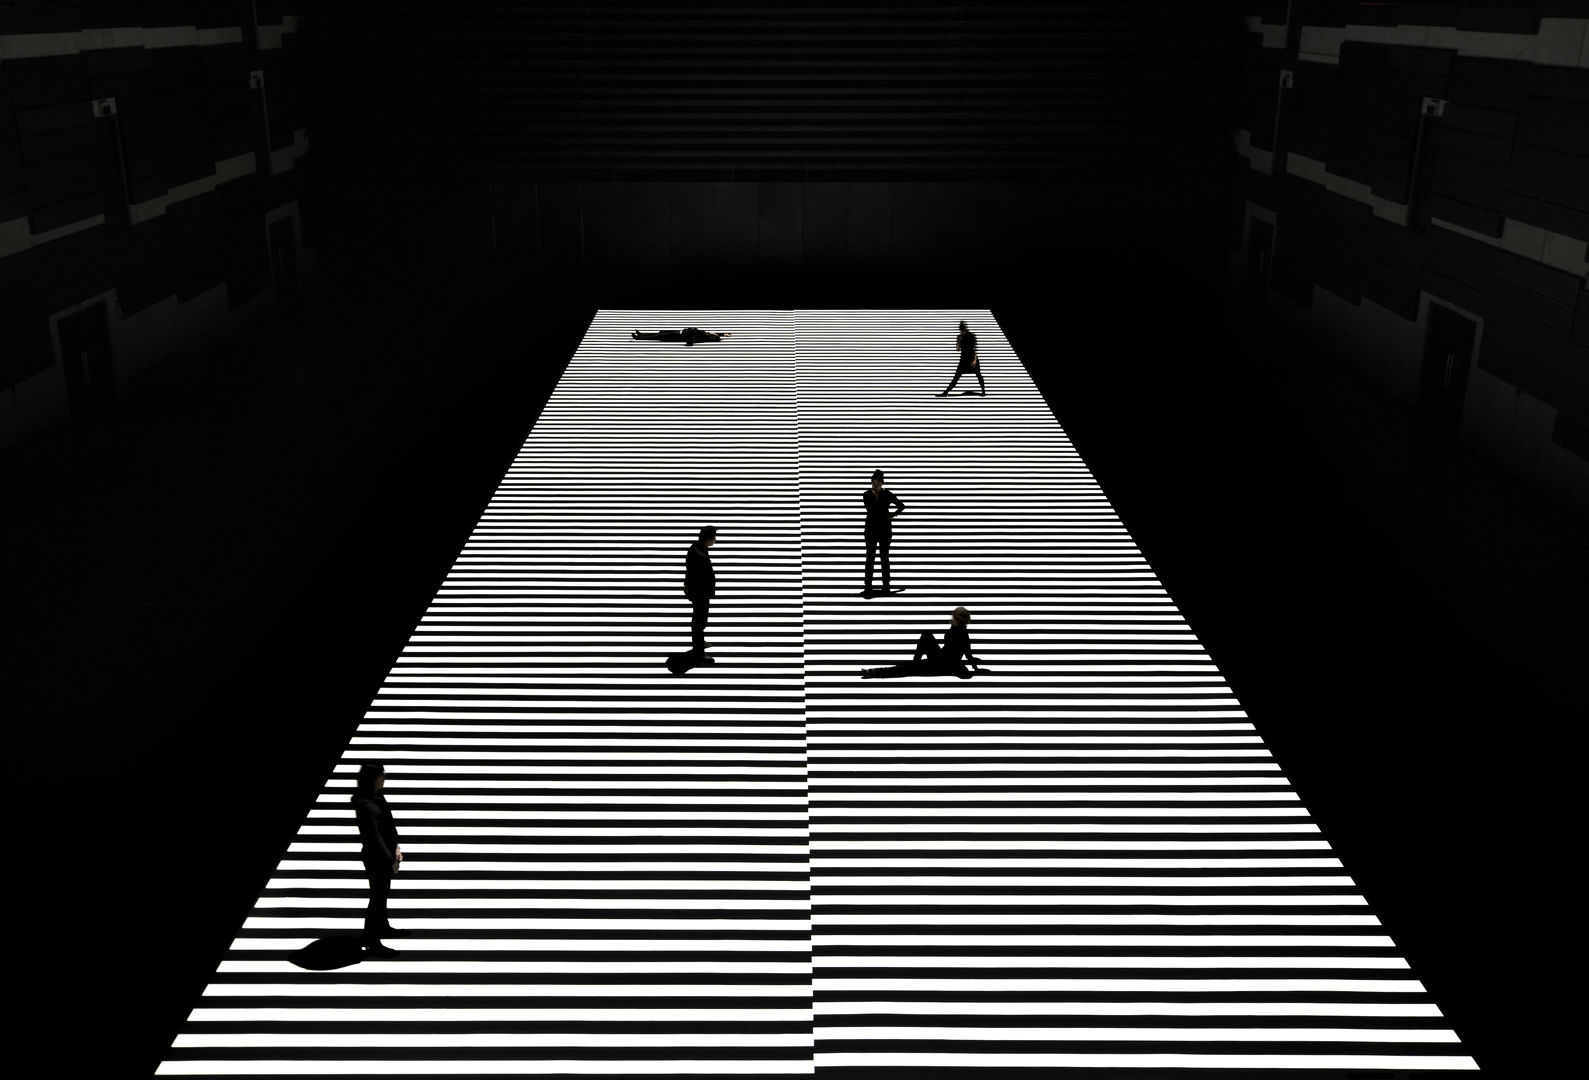 ©, Ryoji Ikeda, test pattern